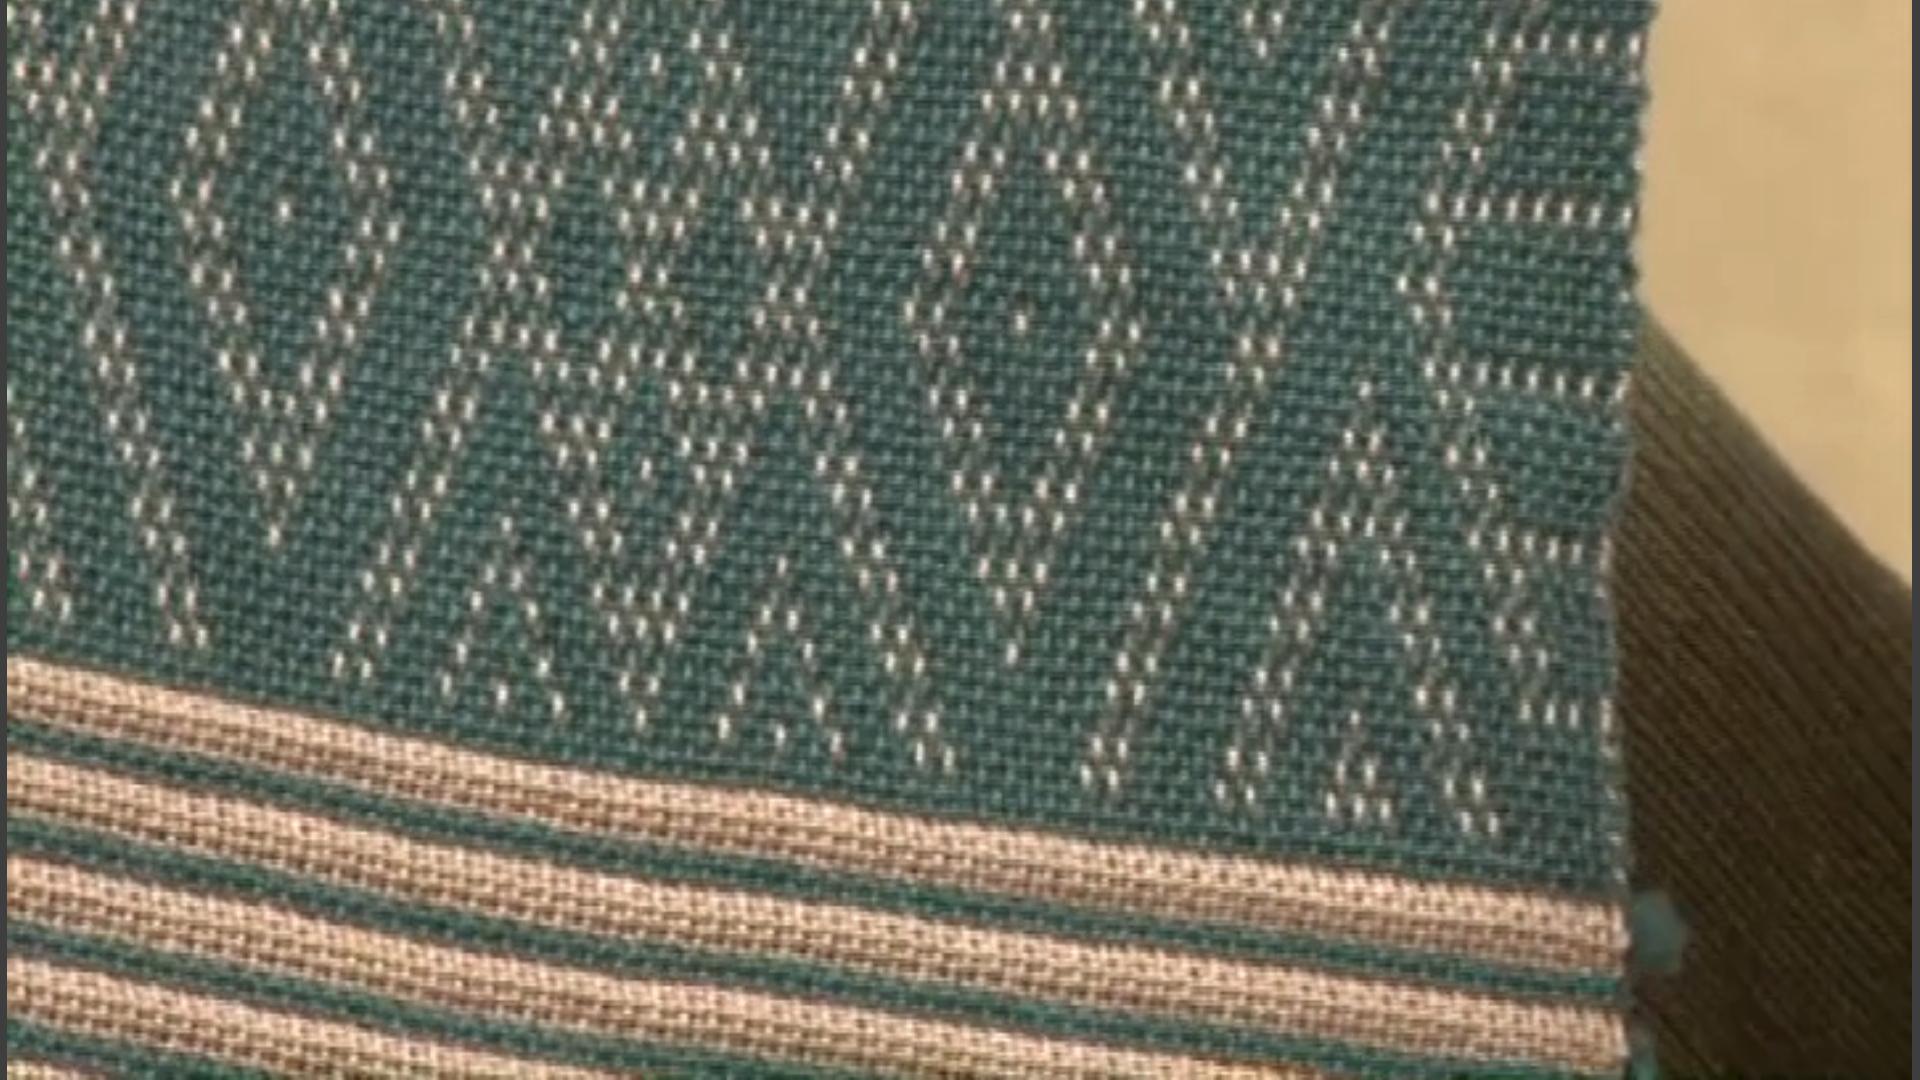 BC|preview|Doubleweave Basics - Part 1|Jennifer  Moore|weaving|CAT2|CAT3|CAT4|CAT5|R0967